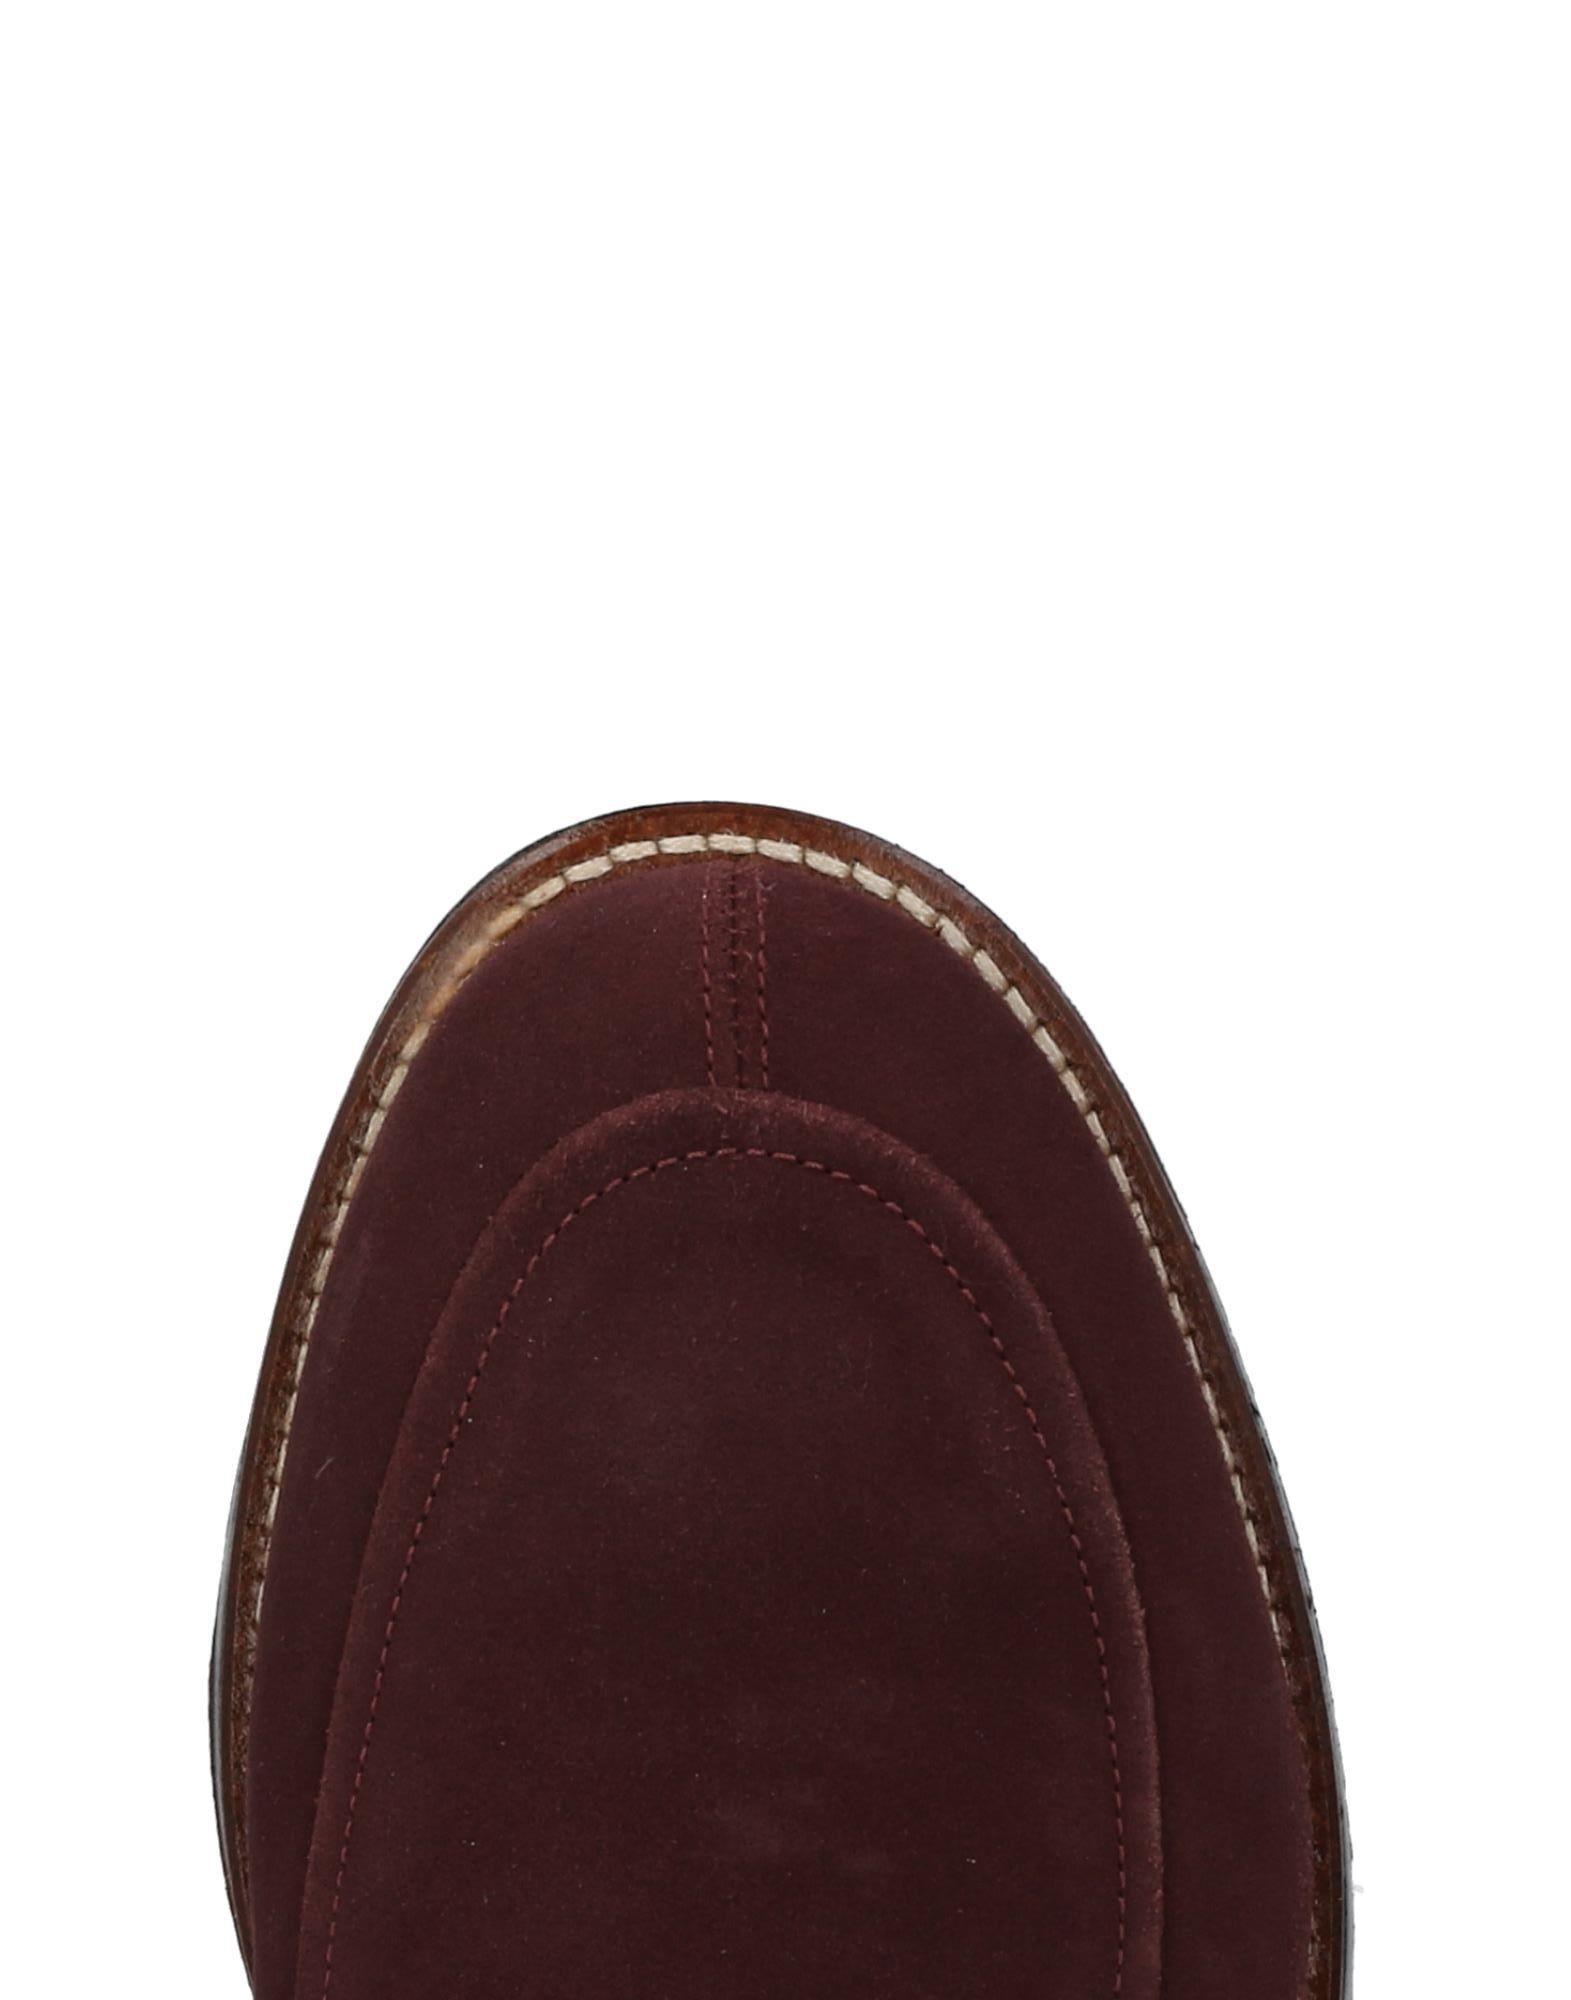 Rabatt echte Mokassins Schuhe Barleycorn Mokassins echte Herren  11479822PV 3f1399